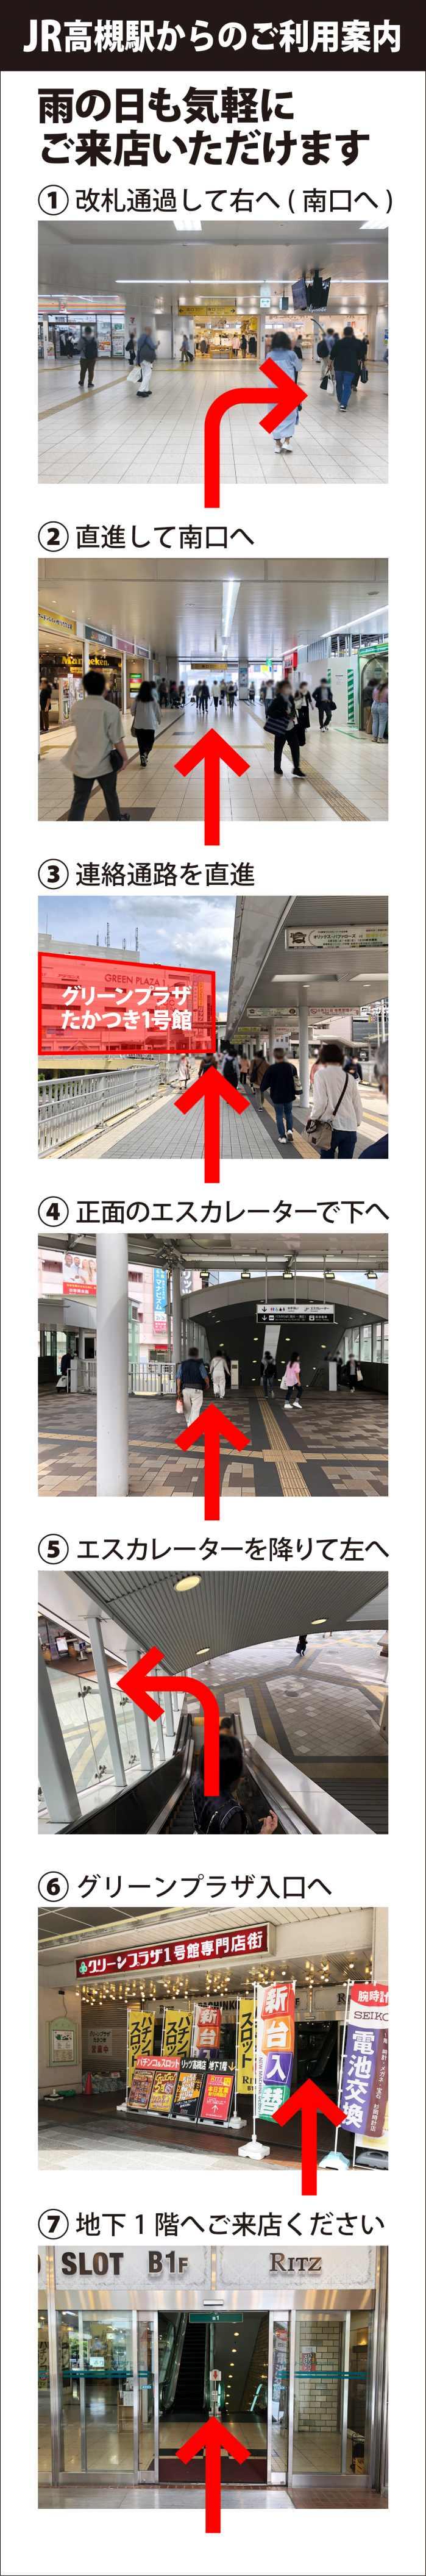 JR高槻駅からのご利用案内